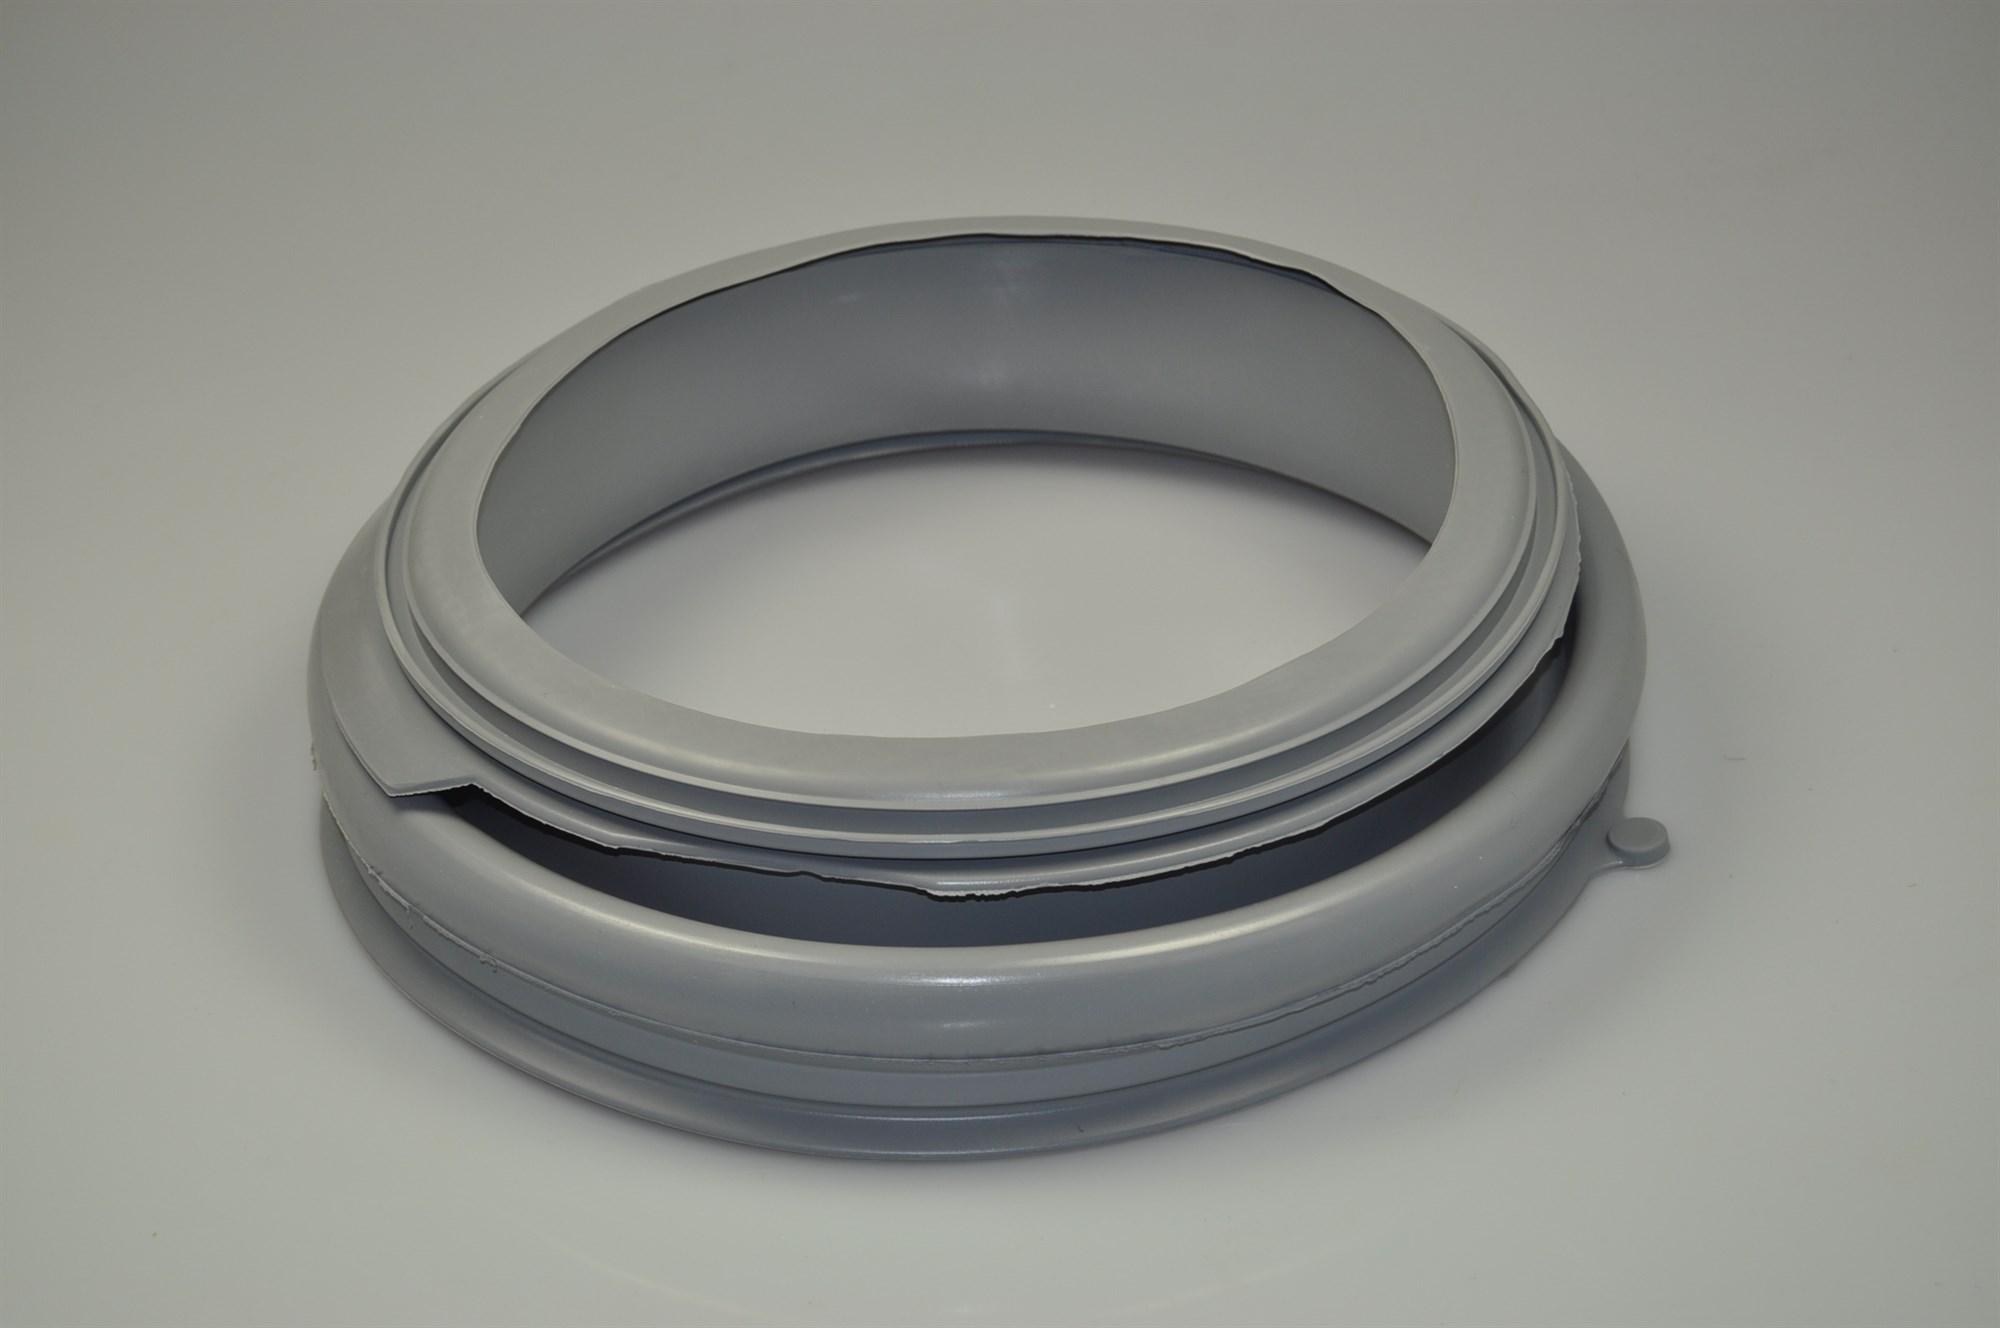 Door Seal Miele Washing Machine Rubber